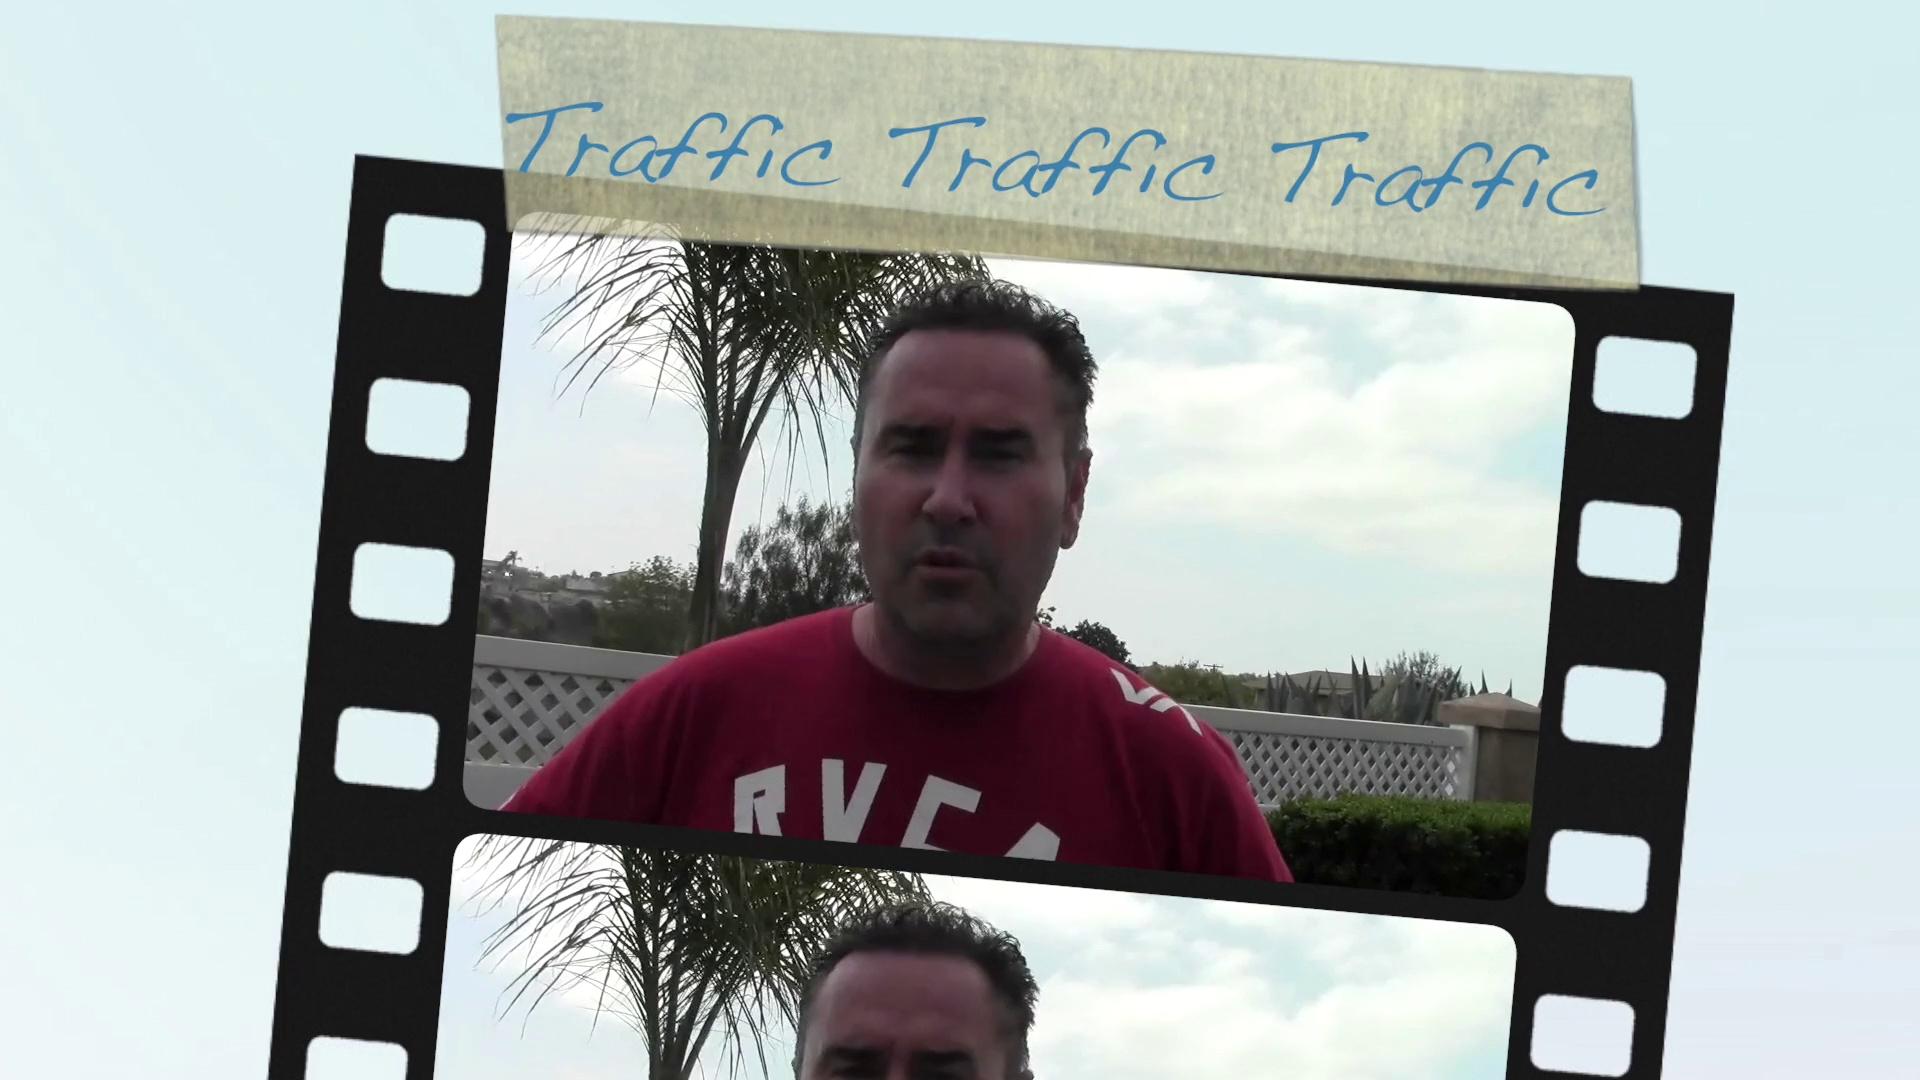 Traffic Traffic Traffic